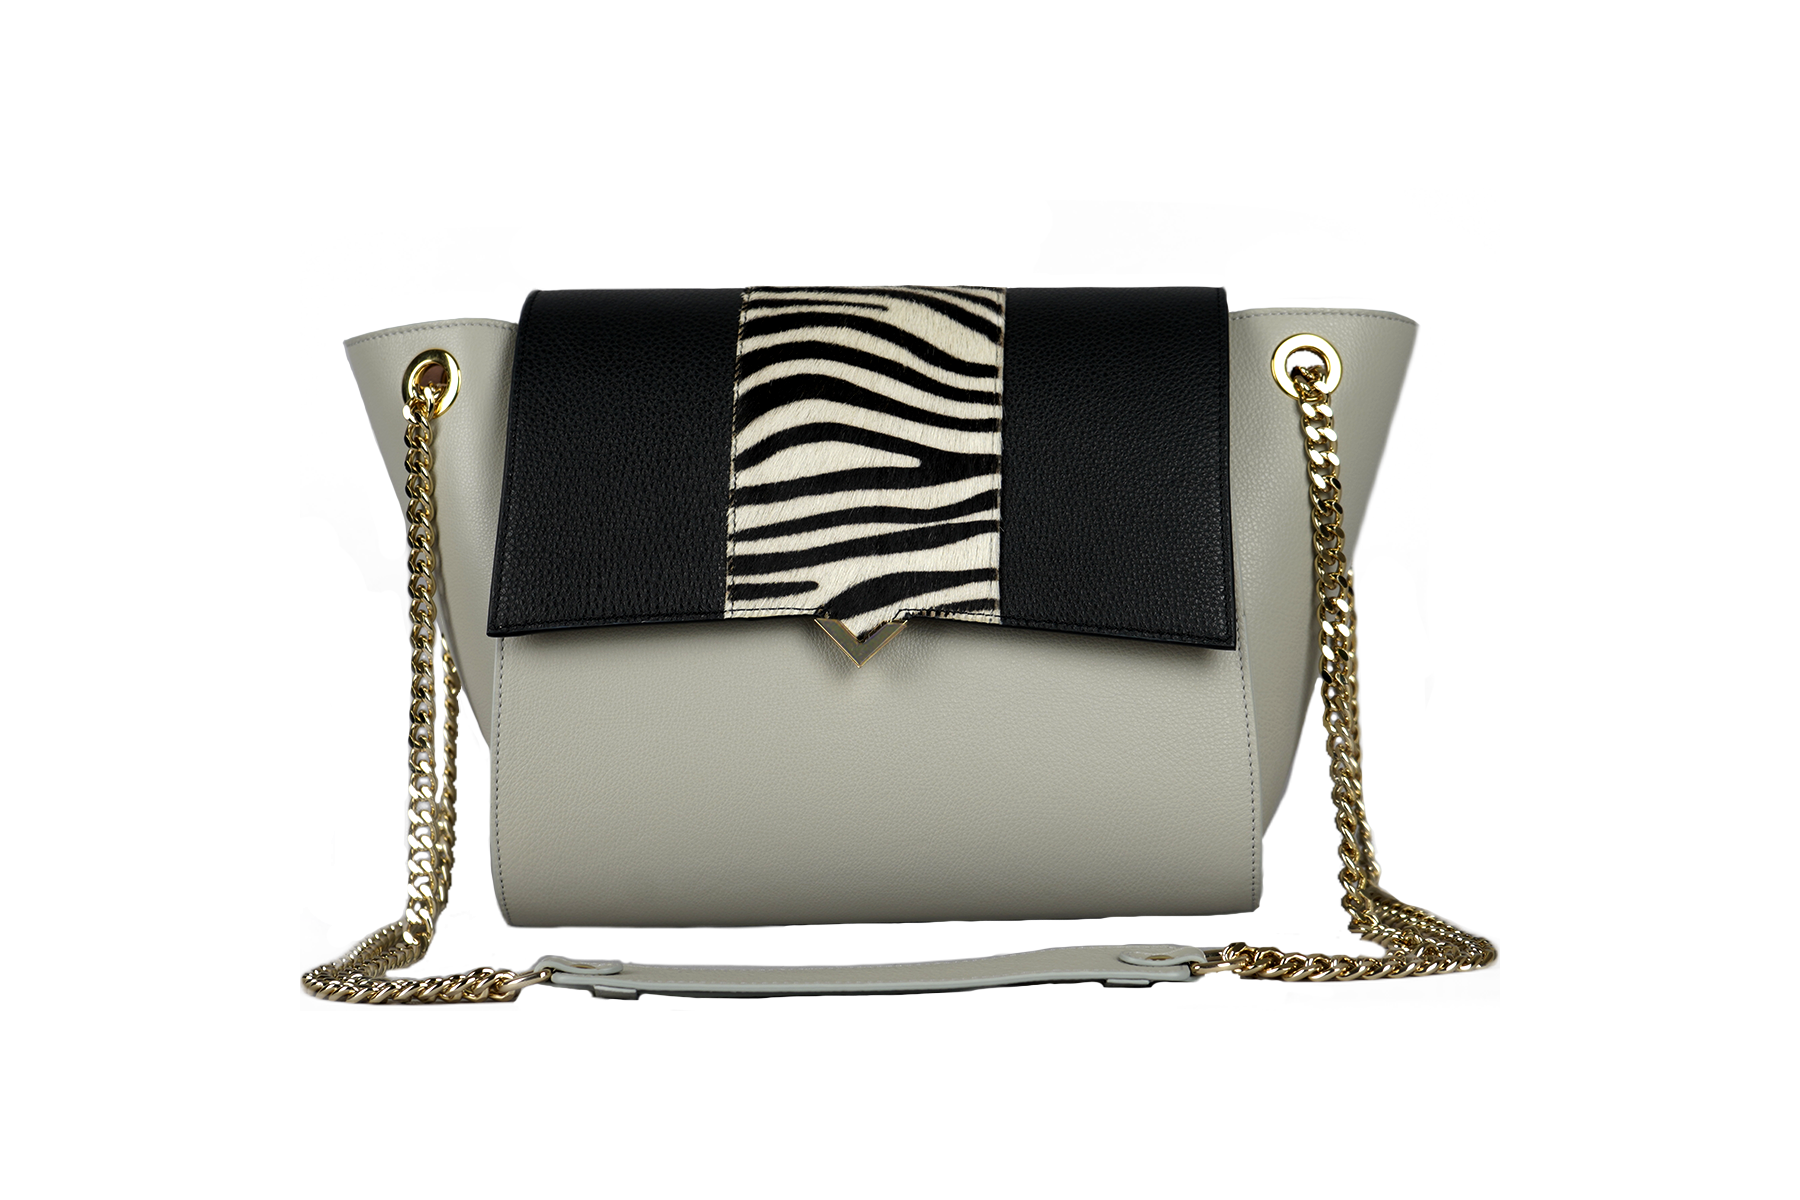 Paris Bag - Pearl Caviar Leather & White Lizard Cover